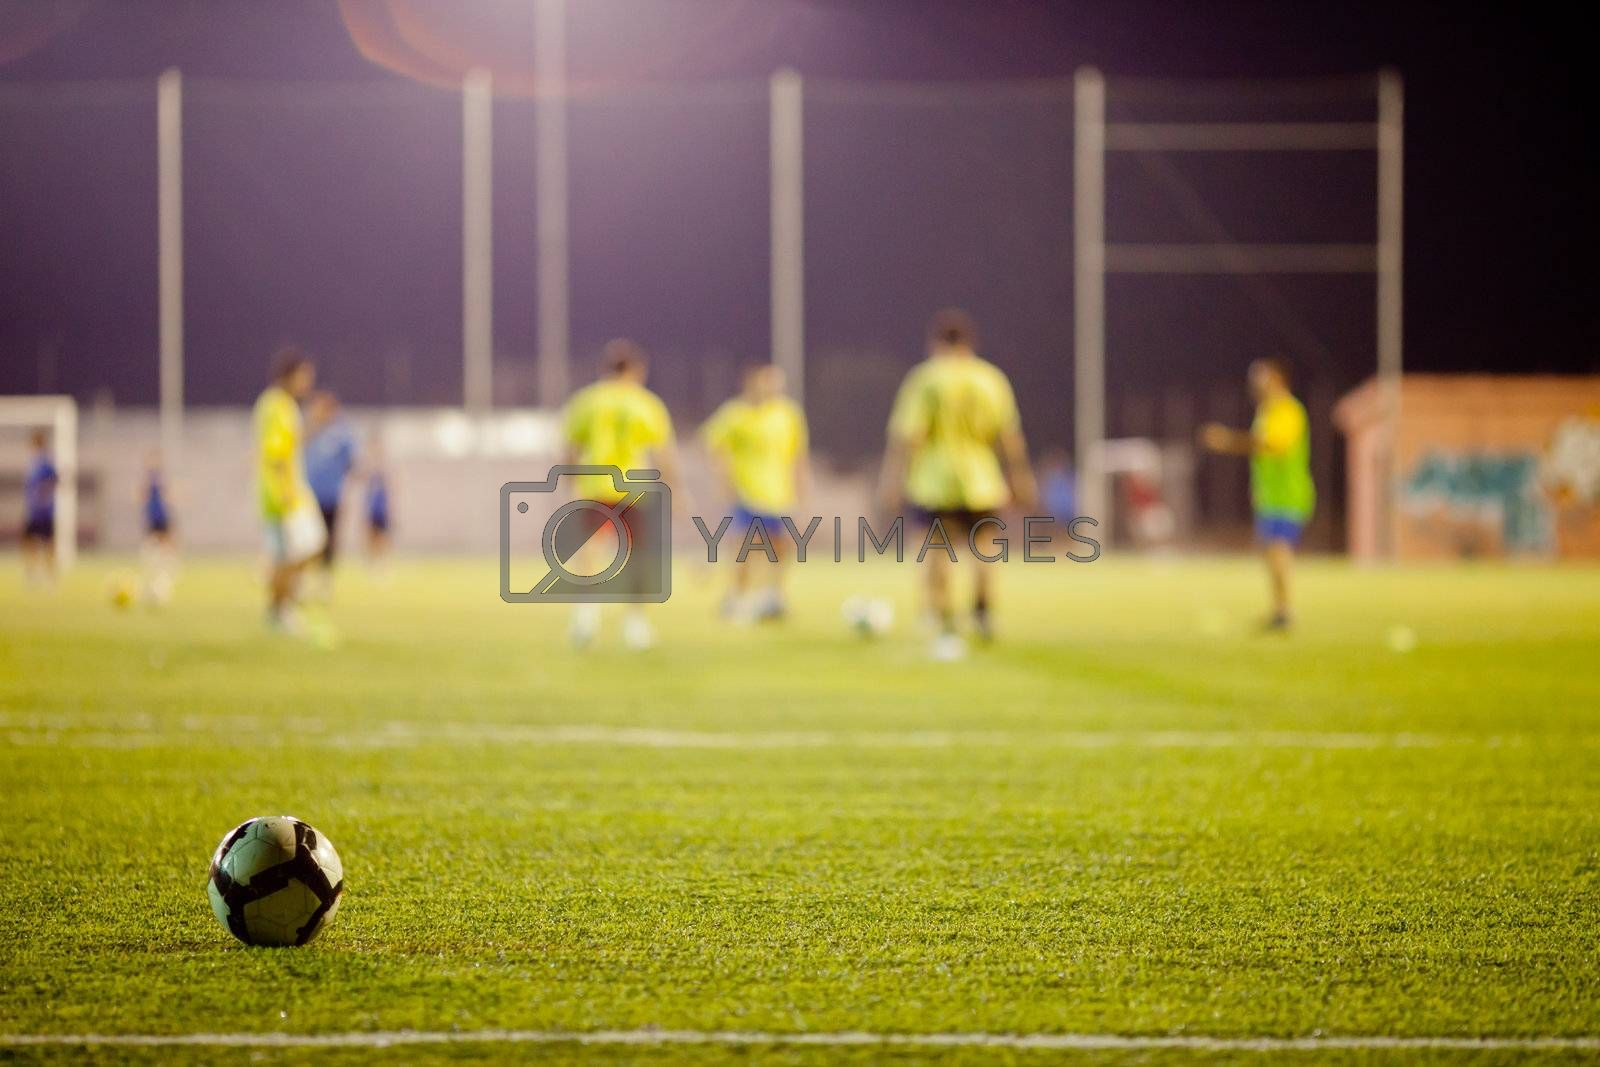 football match during training on stadium